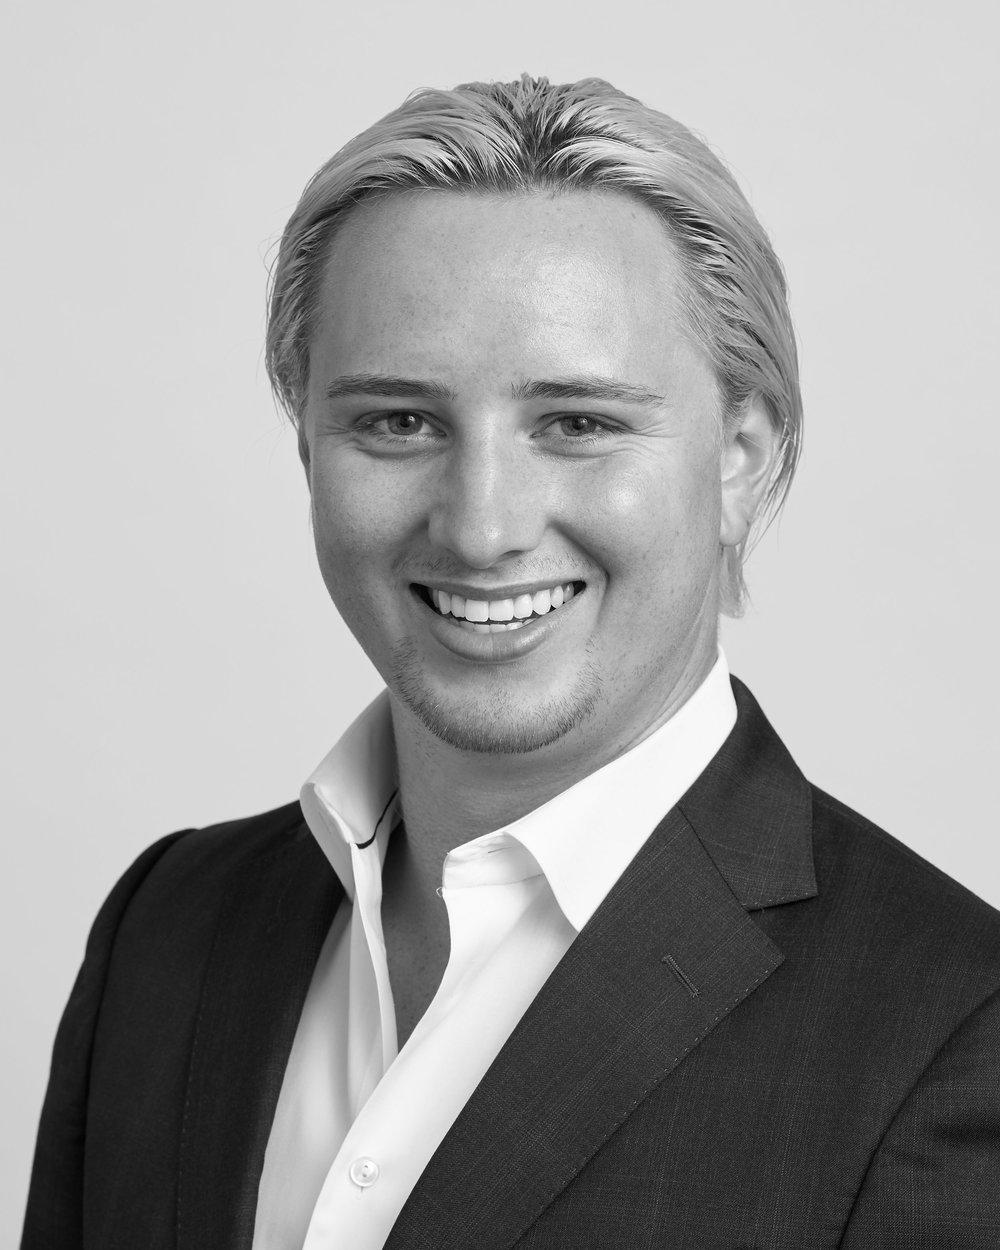 THOR HATTON, CEO -